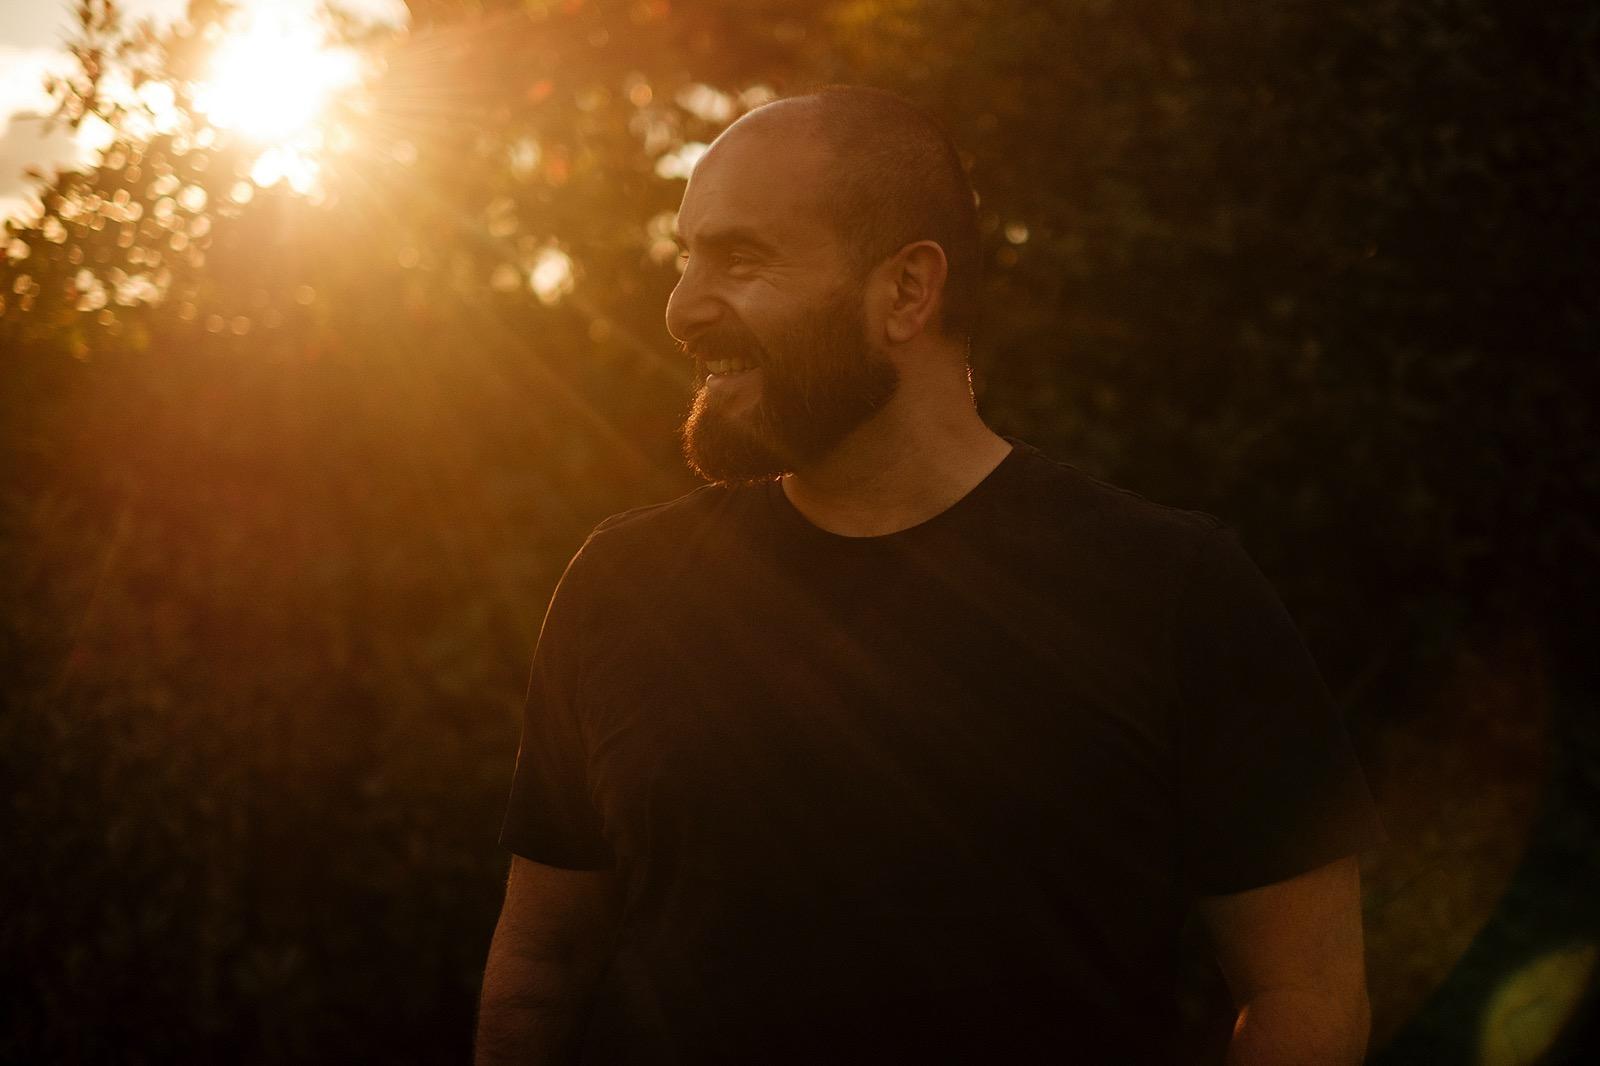 Sunset portrait of man with beard